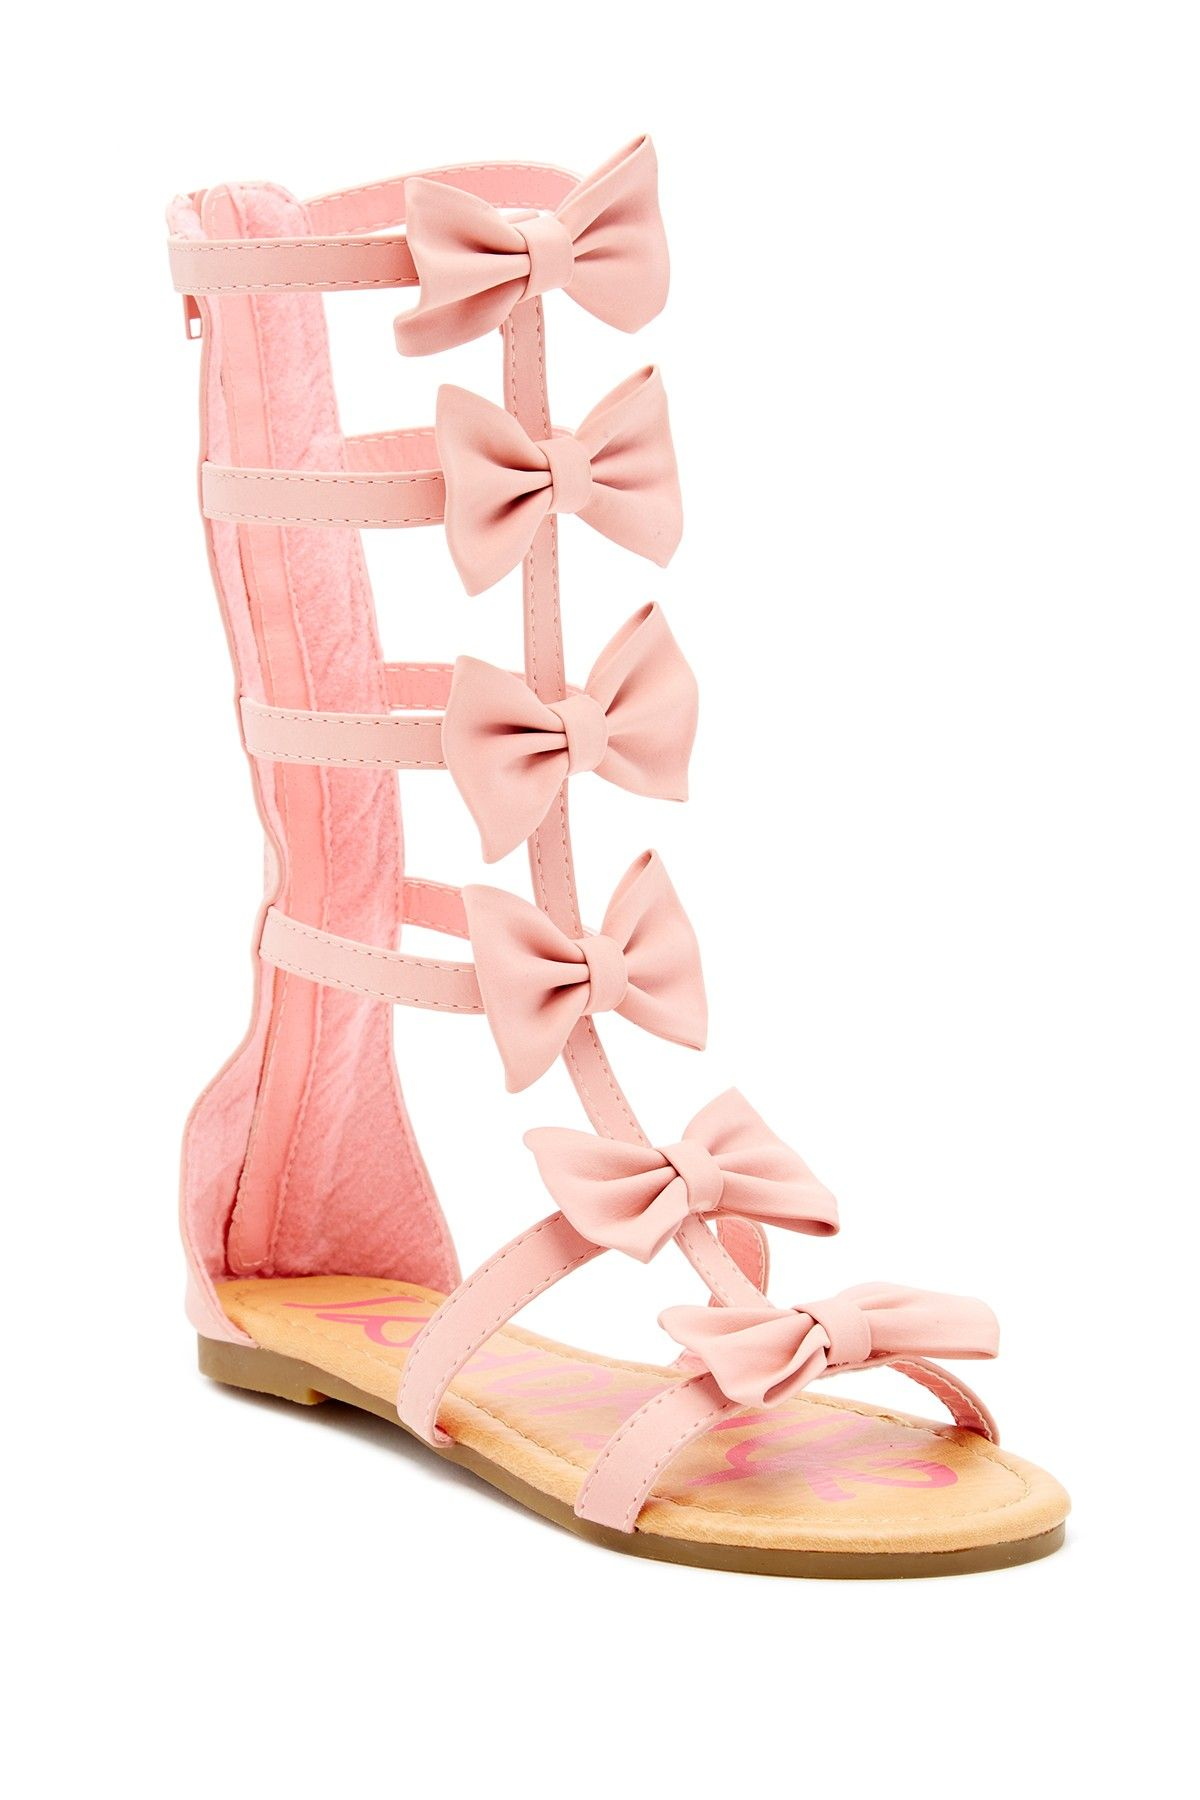 dc6e374702ed Suzette bow gladiator sandal yoki on hautelook o e jpg 1200x1800 Joyfolie  jayla gladiator sandal